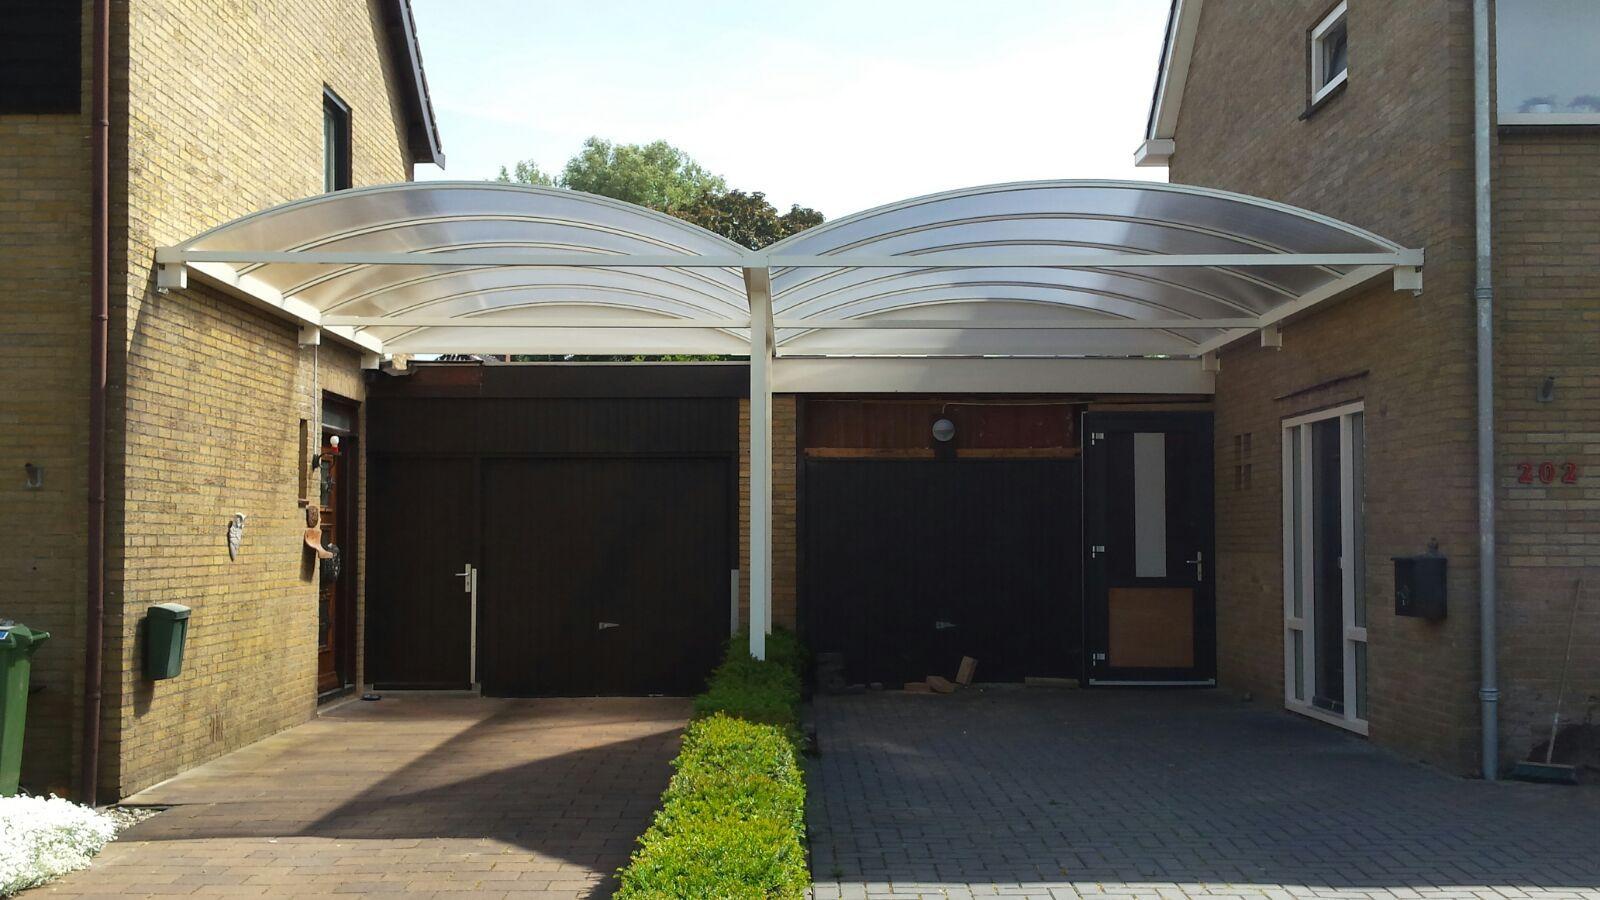 Dubbele carport boog | Aluminium carports | Pinterest | Aluminum carport